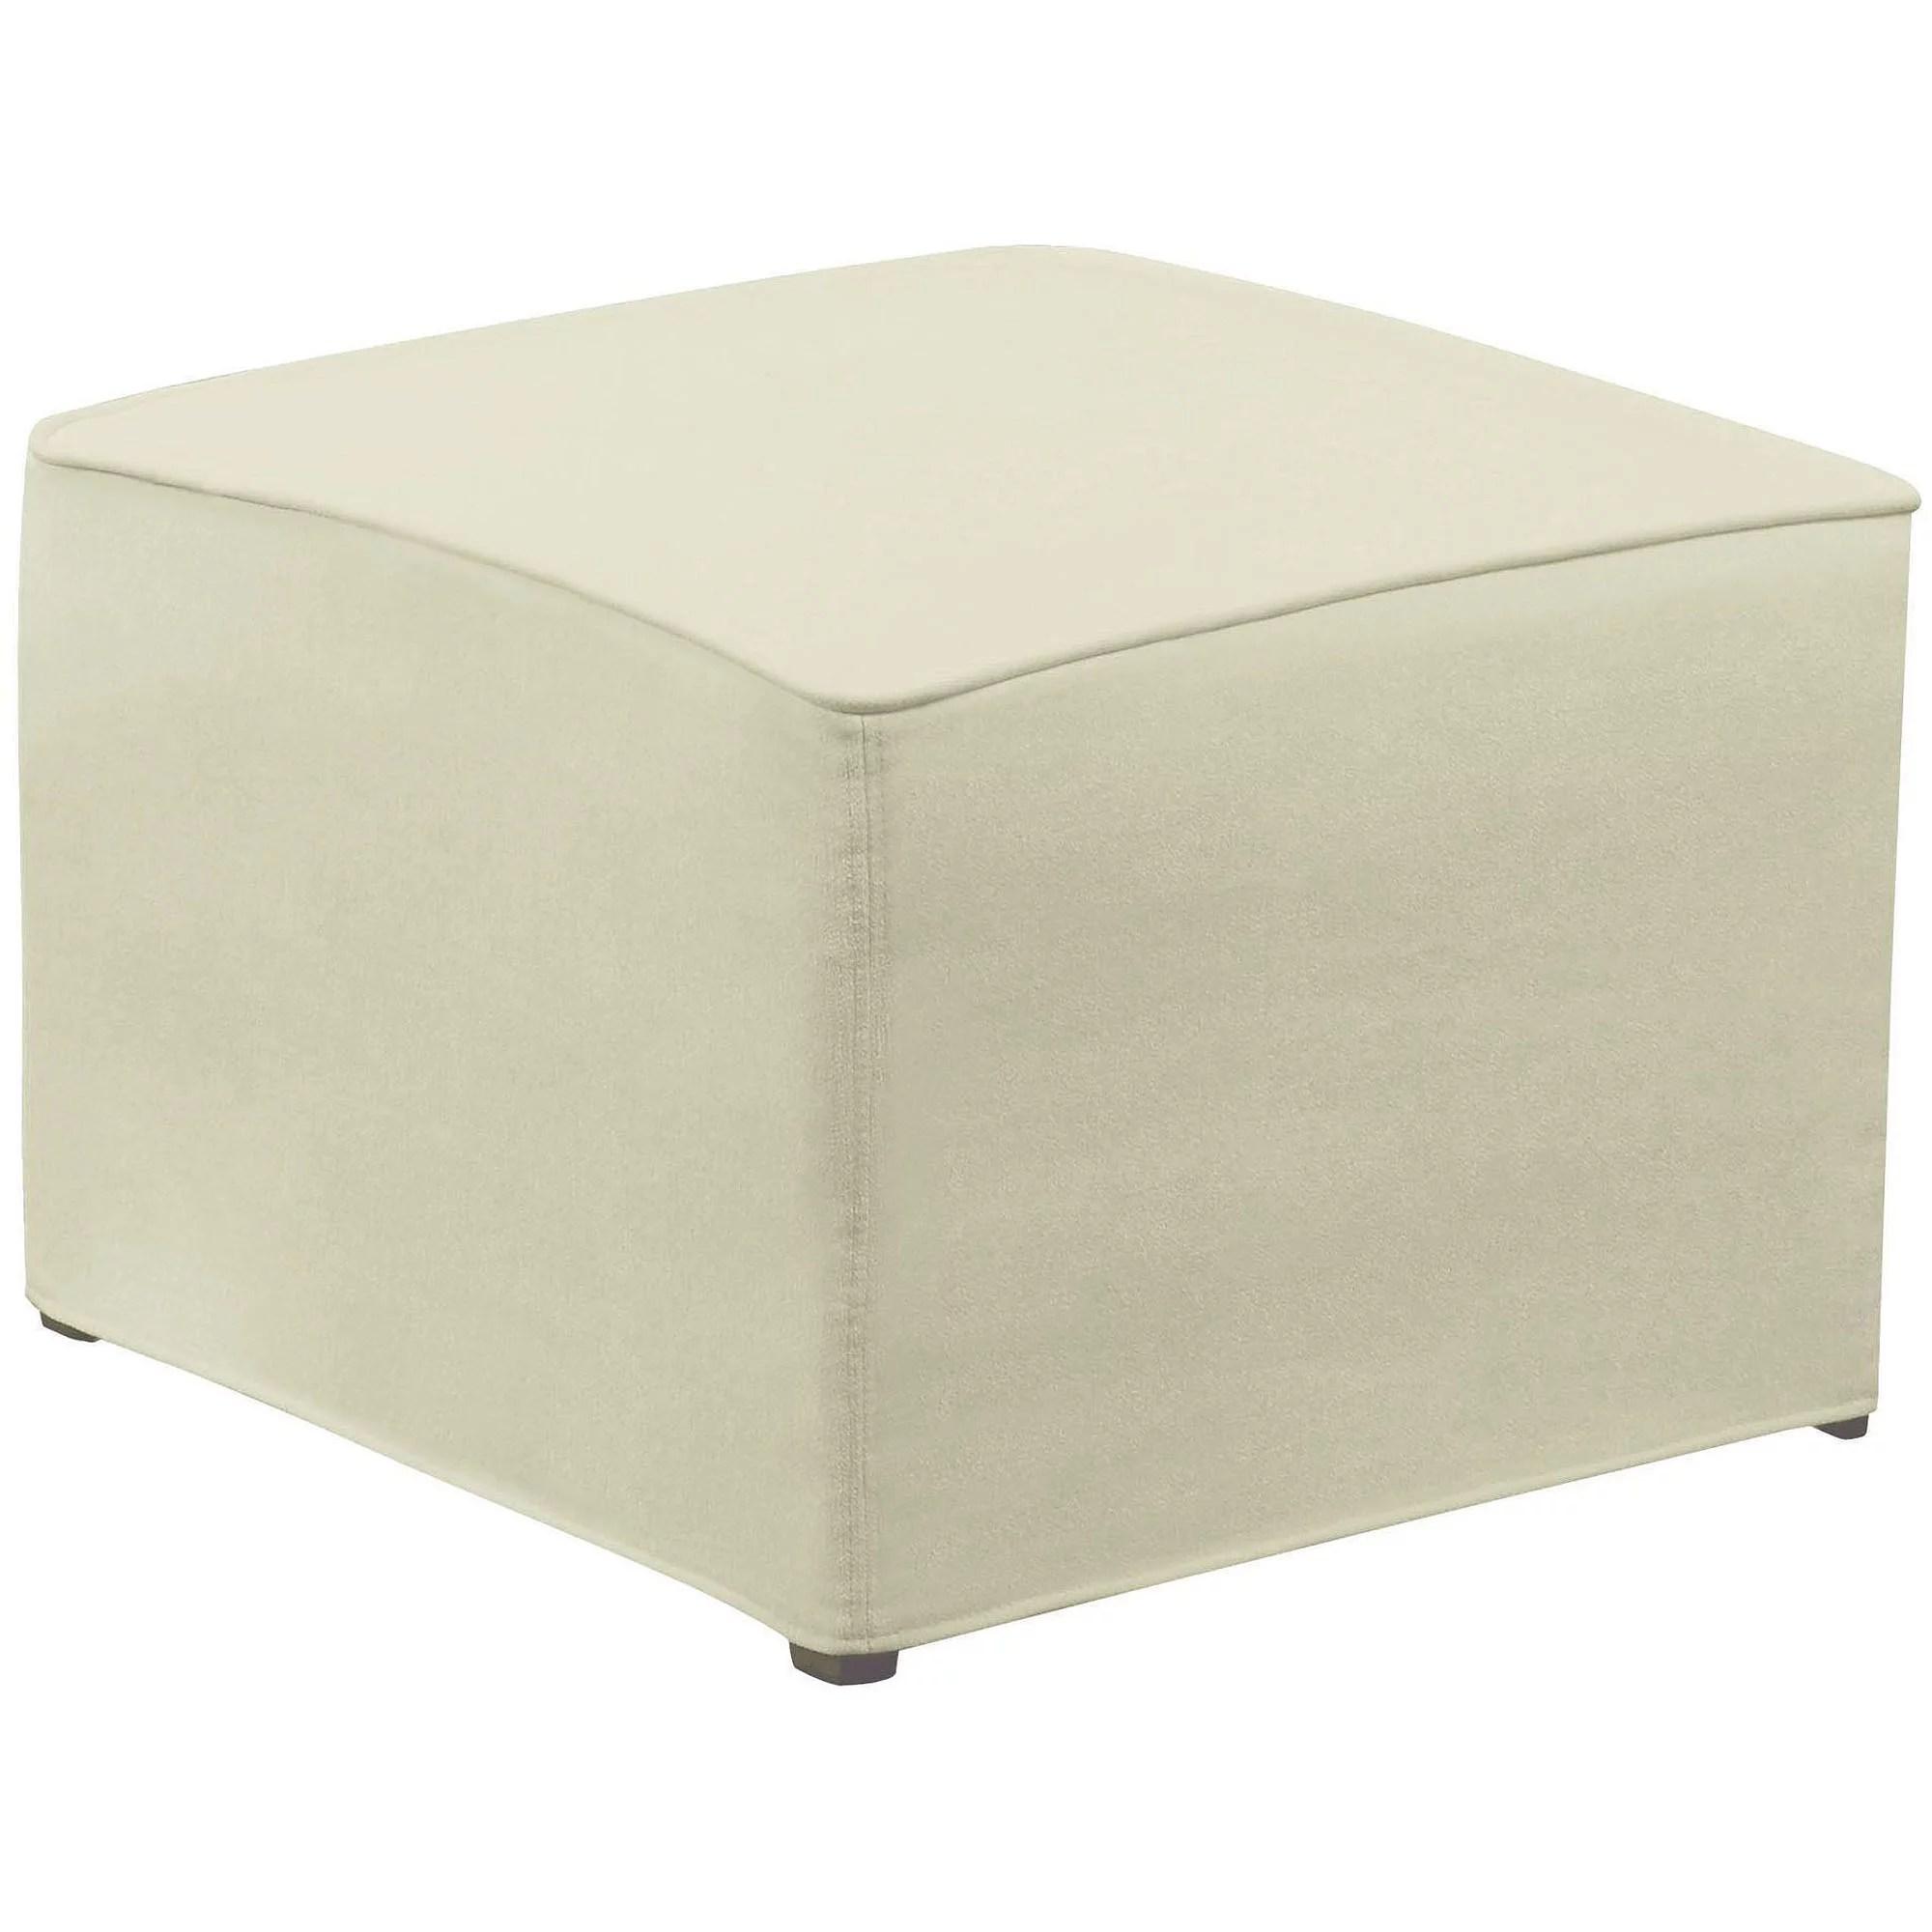 dorel rocking chair diy wooden seat replacement with ottoman beige walmart com